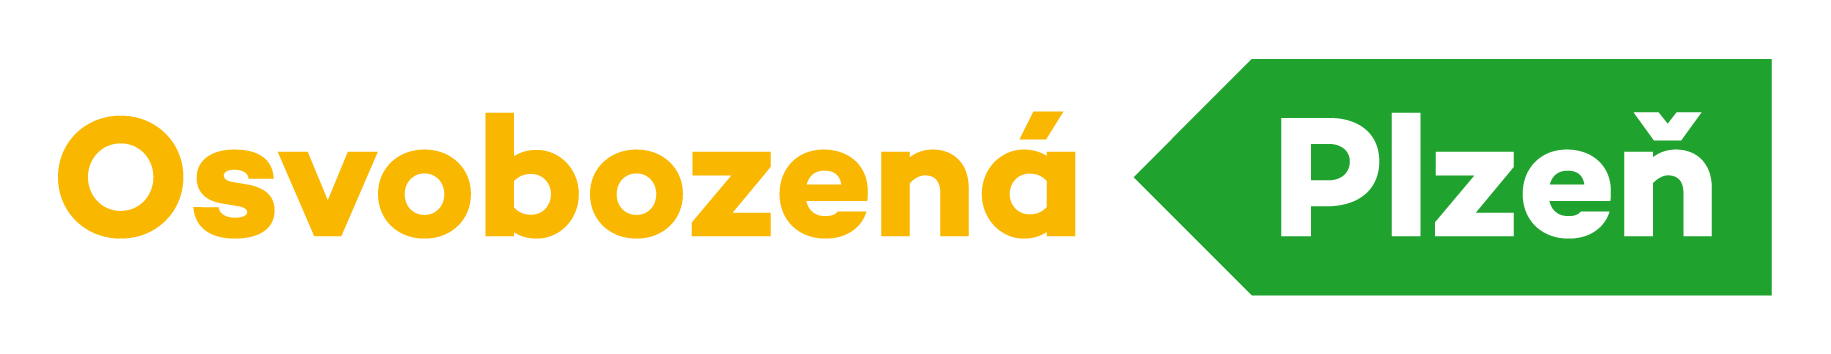 Plzeň 2017